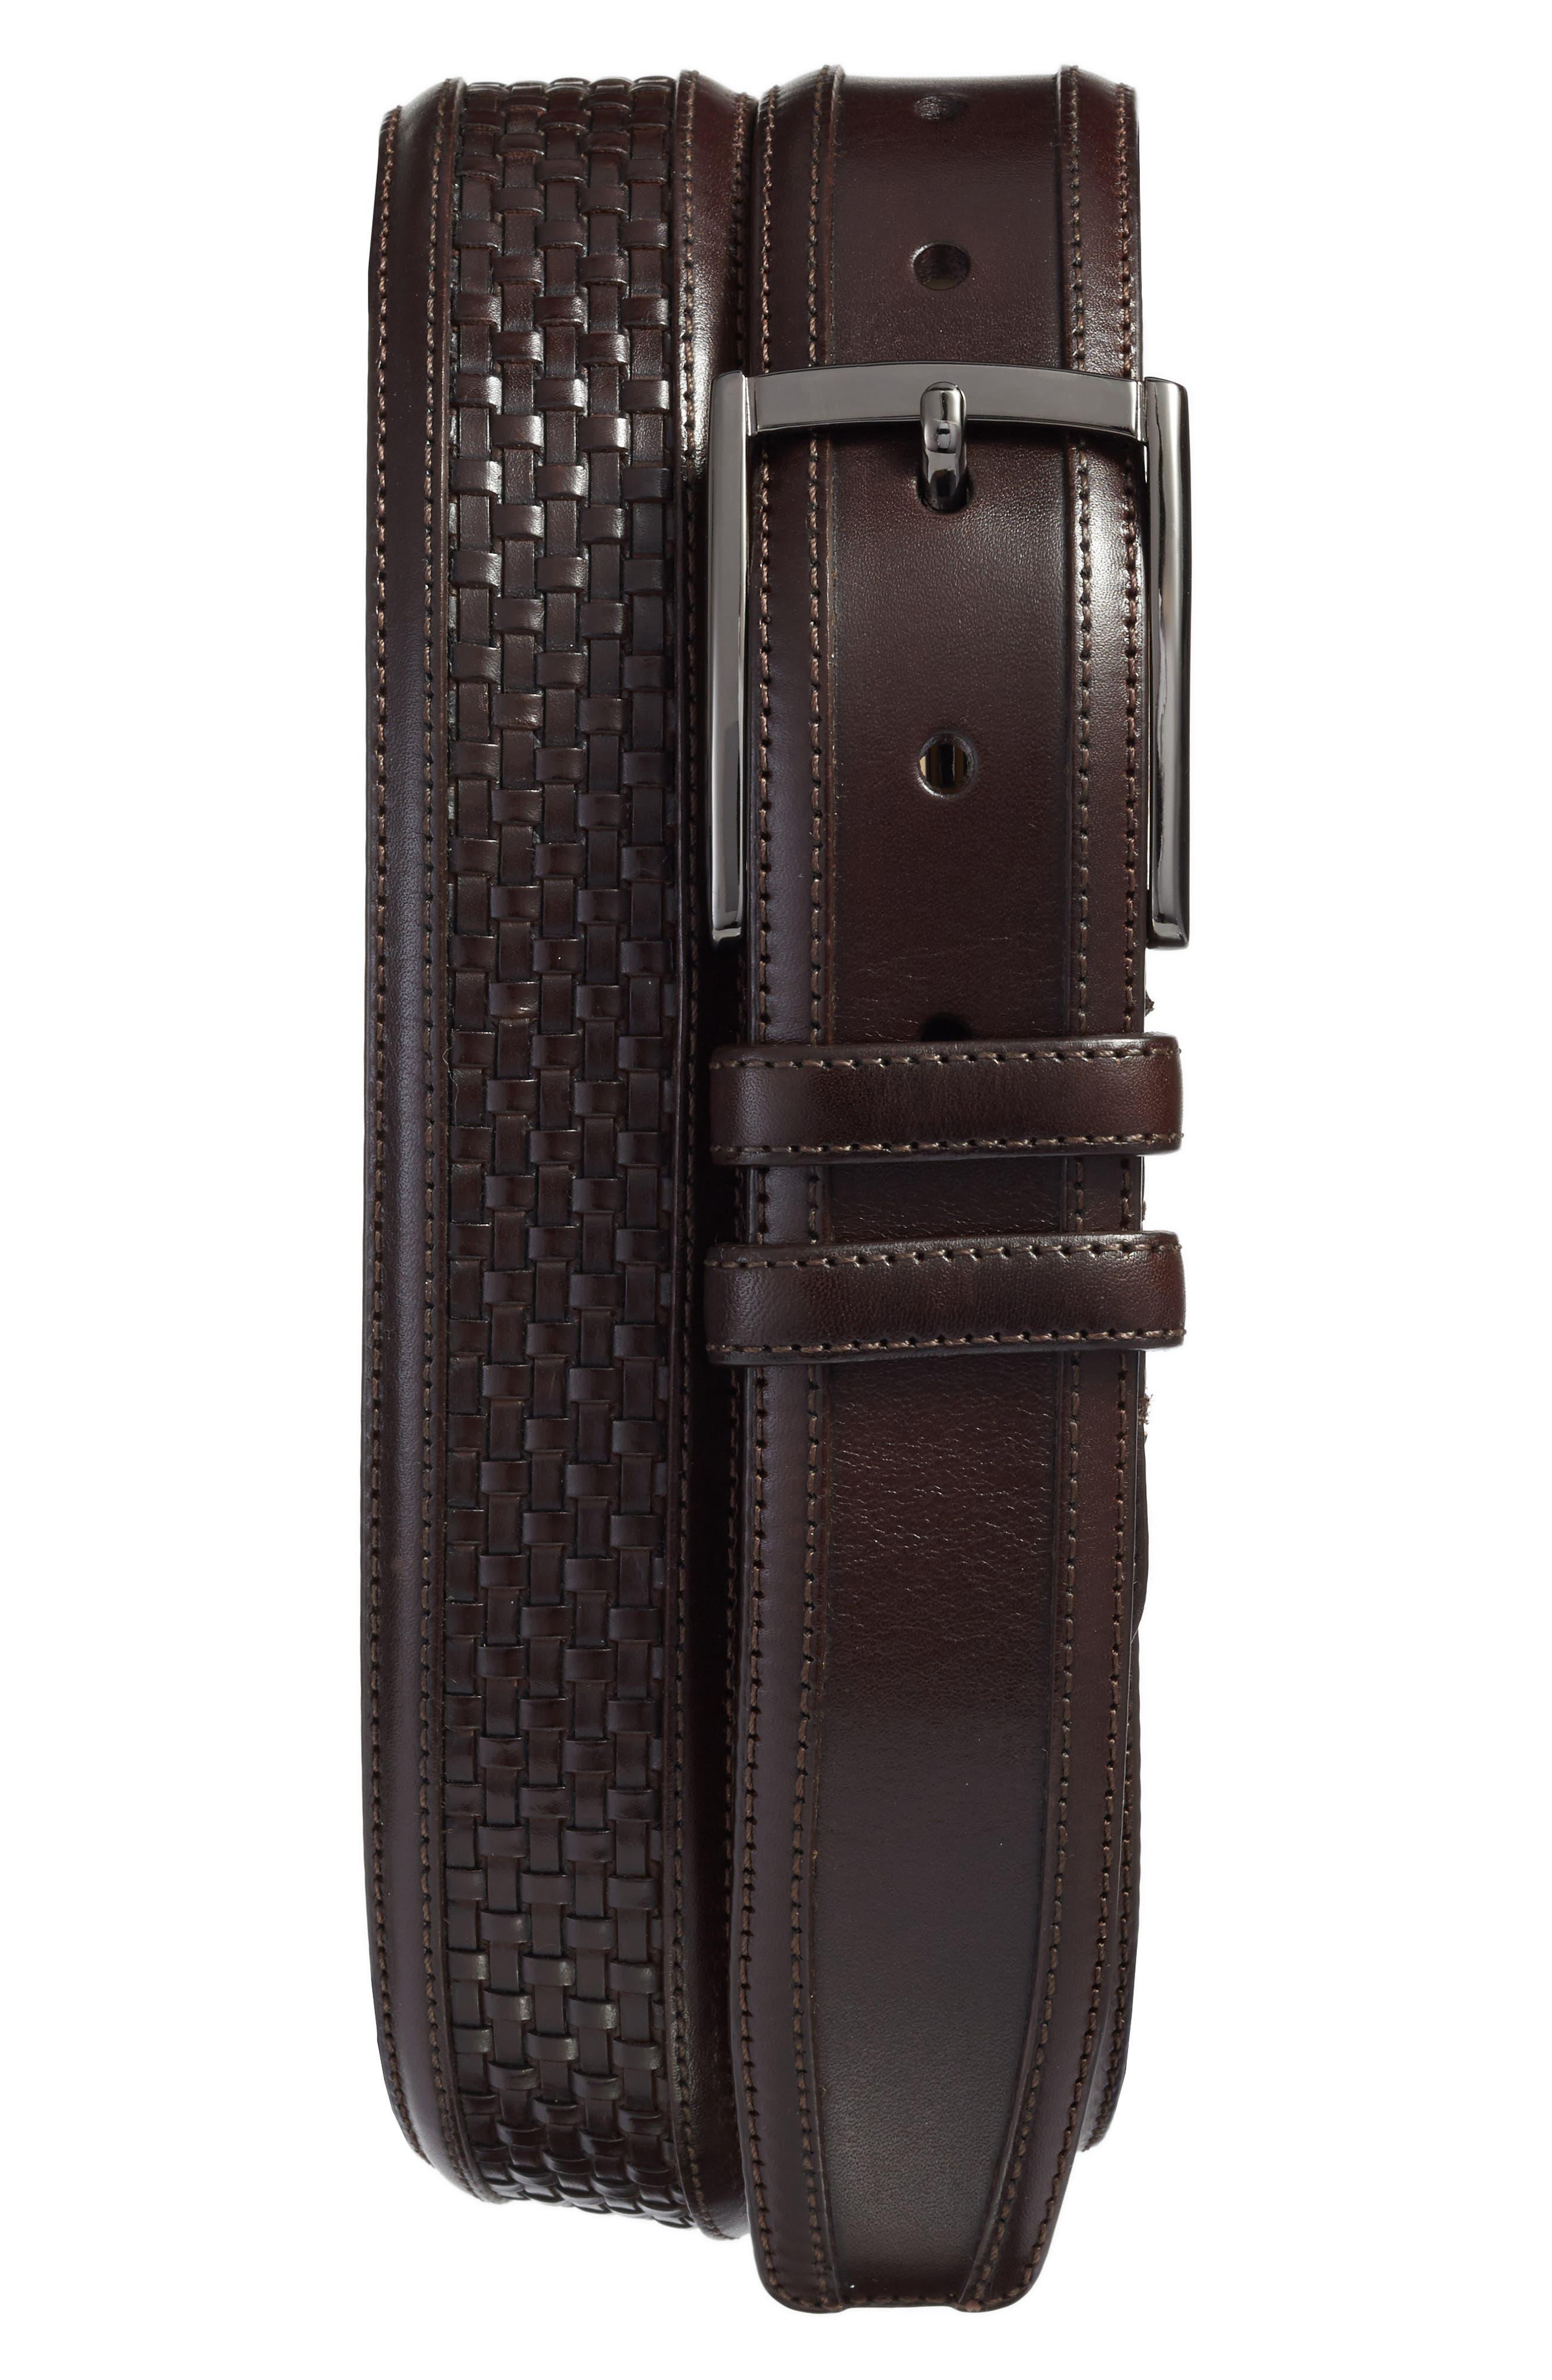 Main Image - Mezlan Parma Woven Leather Belt